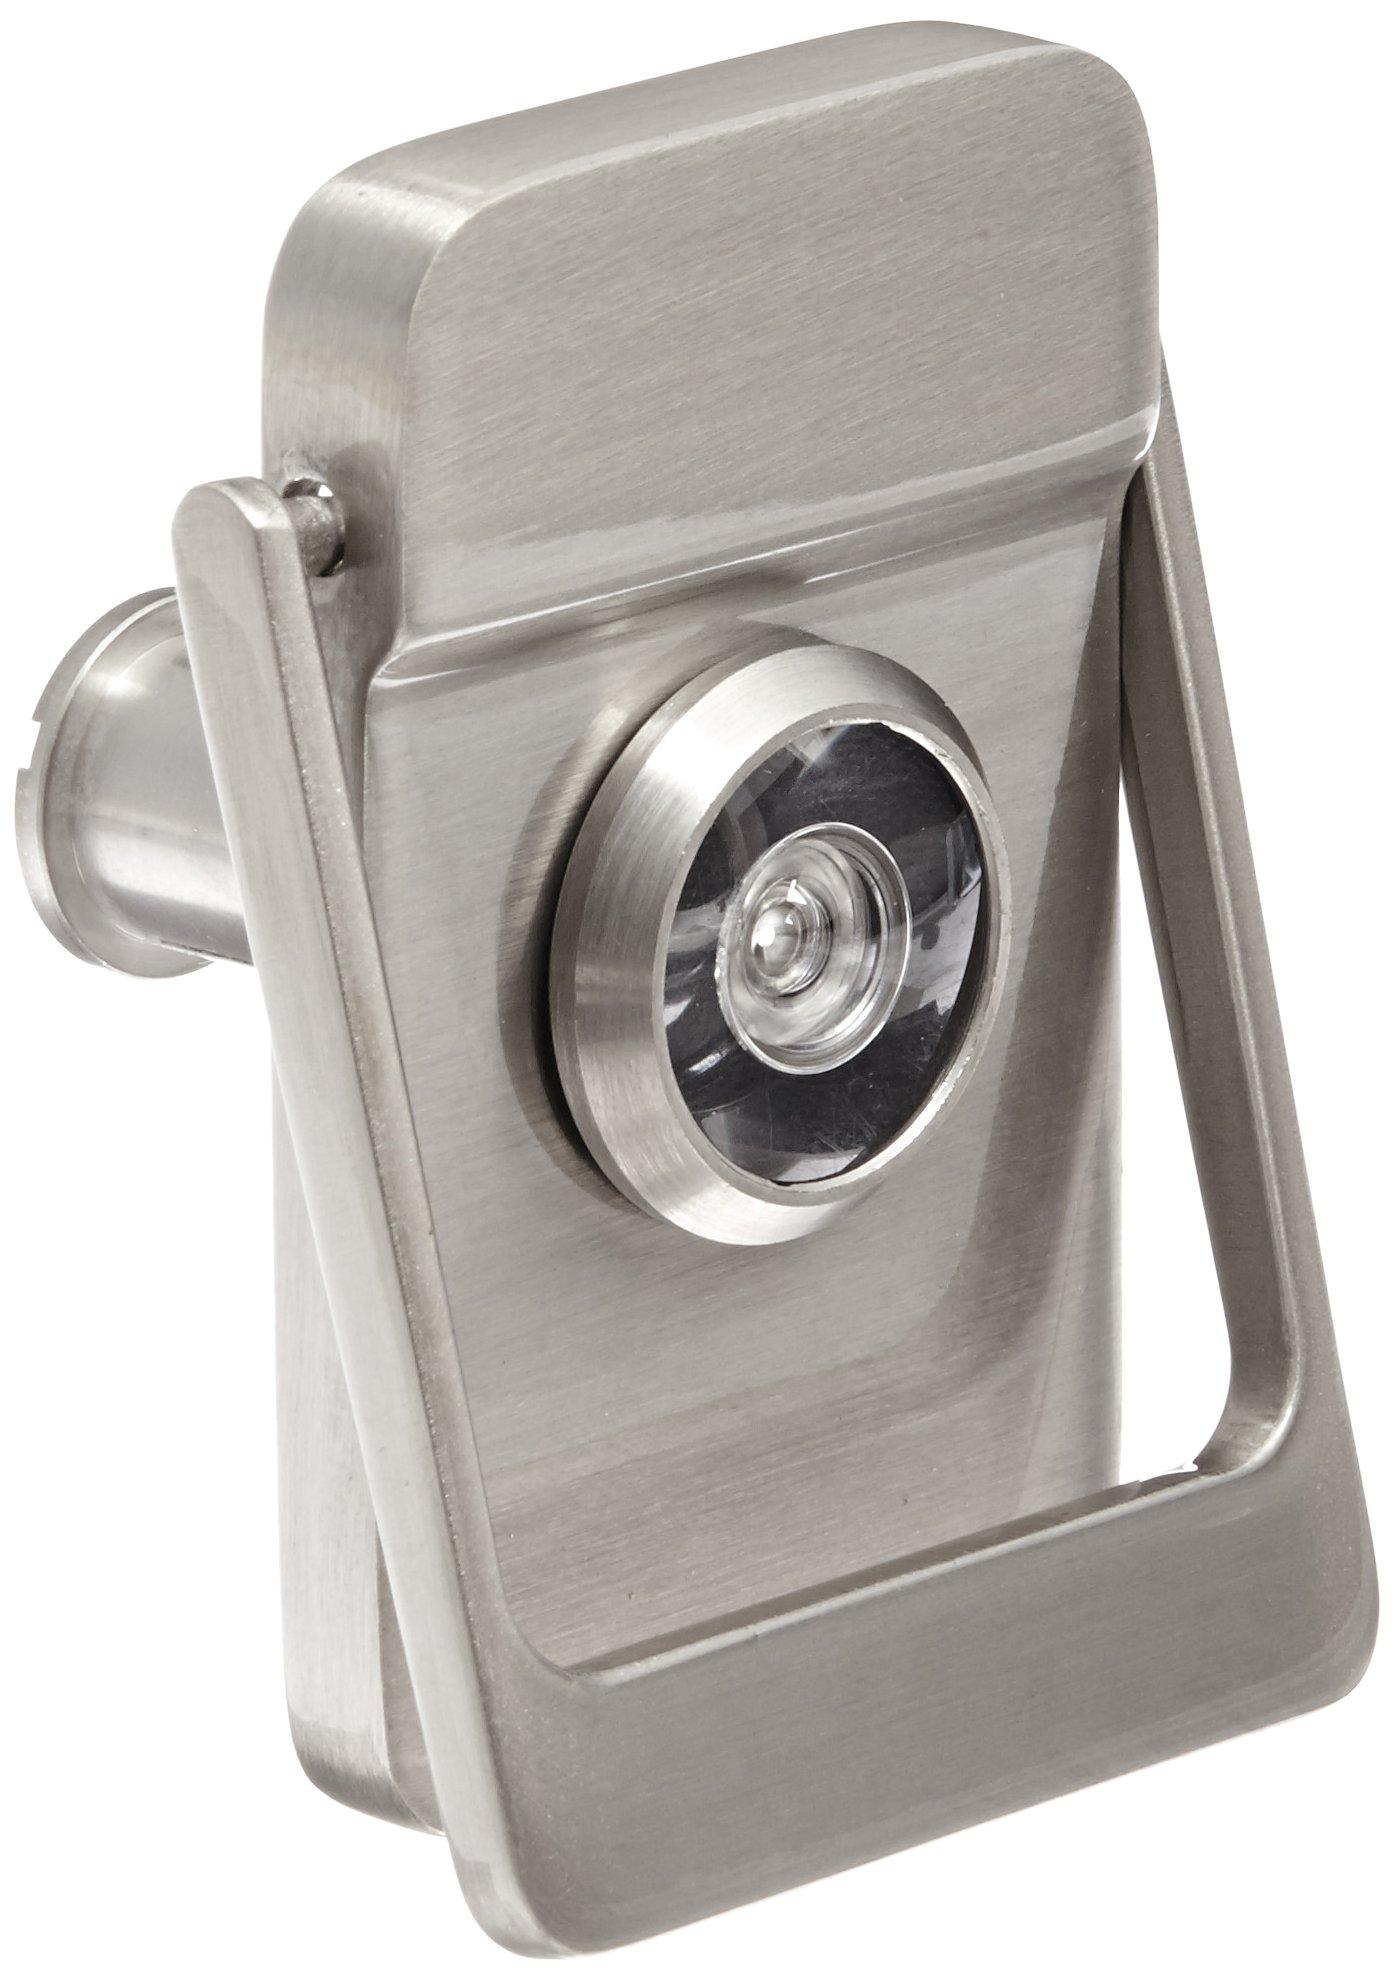 Rockwood 614V.15 Brass Door Knocker with Door Viewer, 2-1/8'' Width x 3'' Height, Satin Nickel Plated Clear Coated Finish